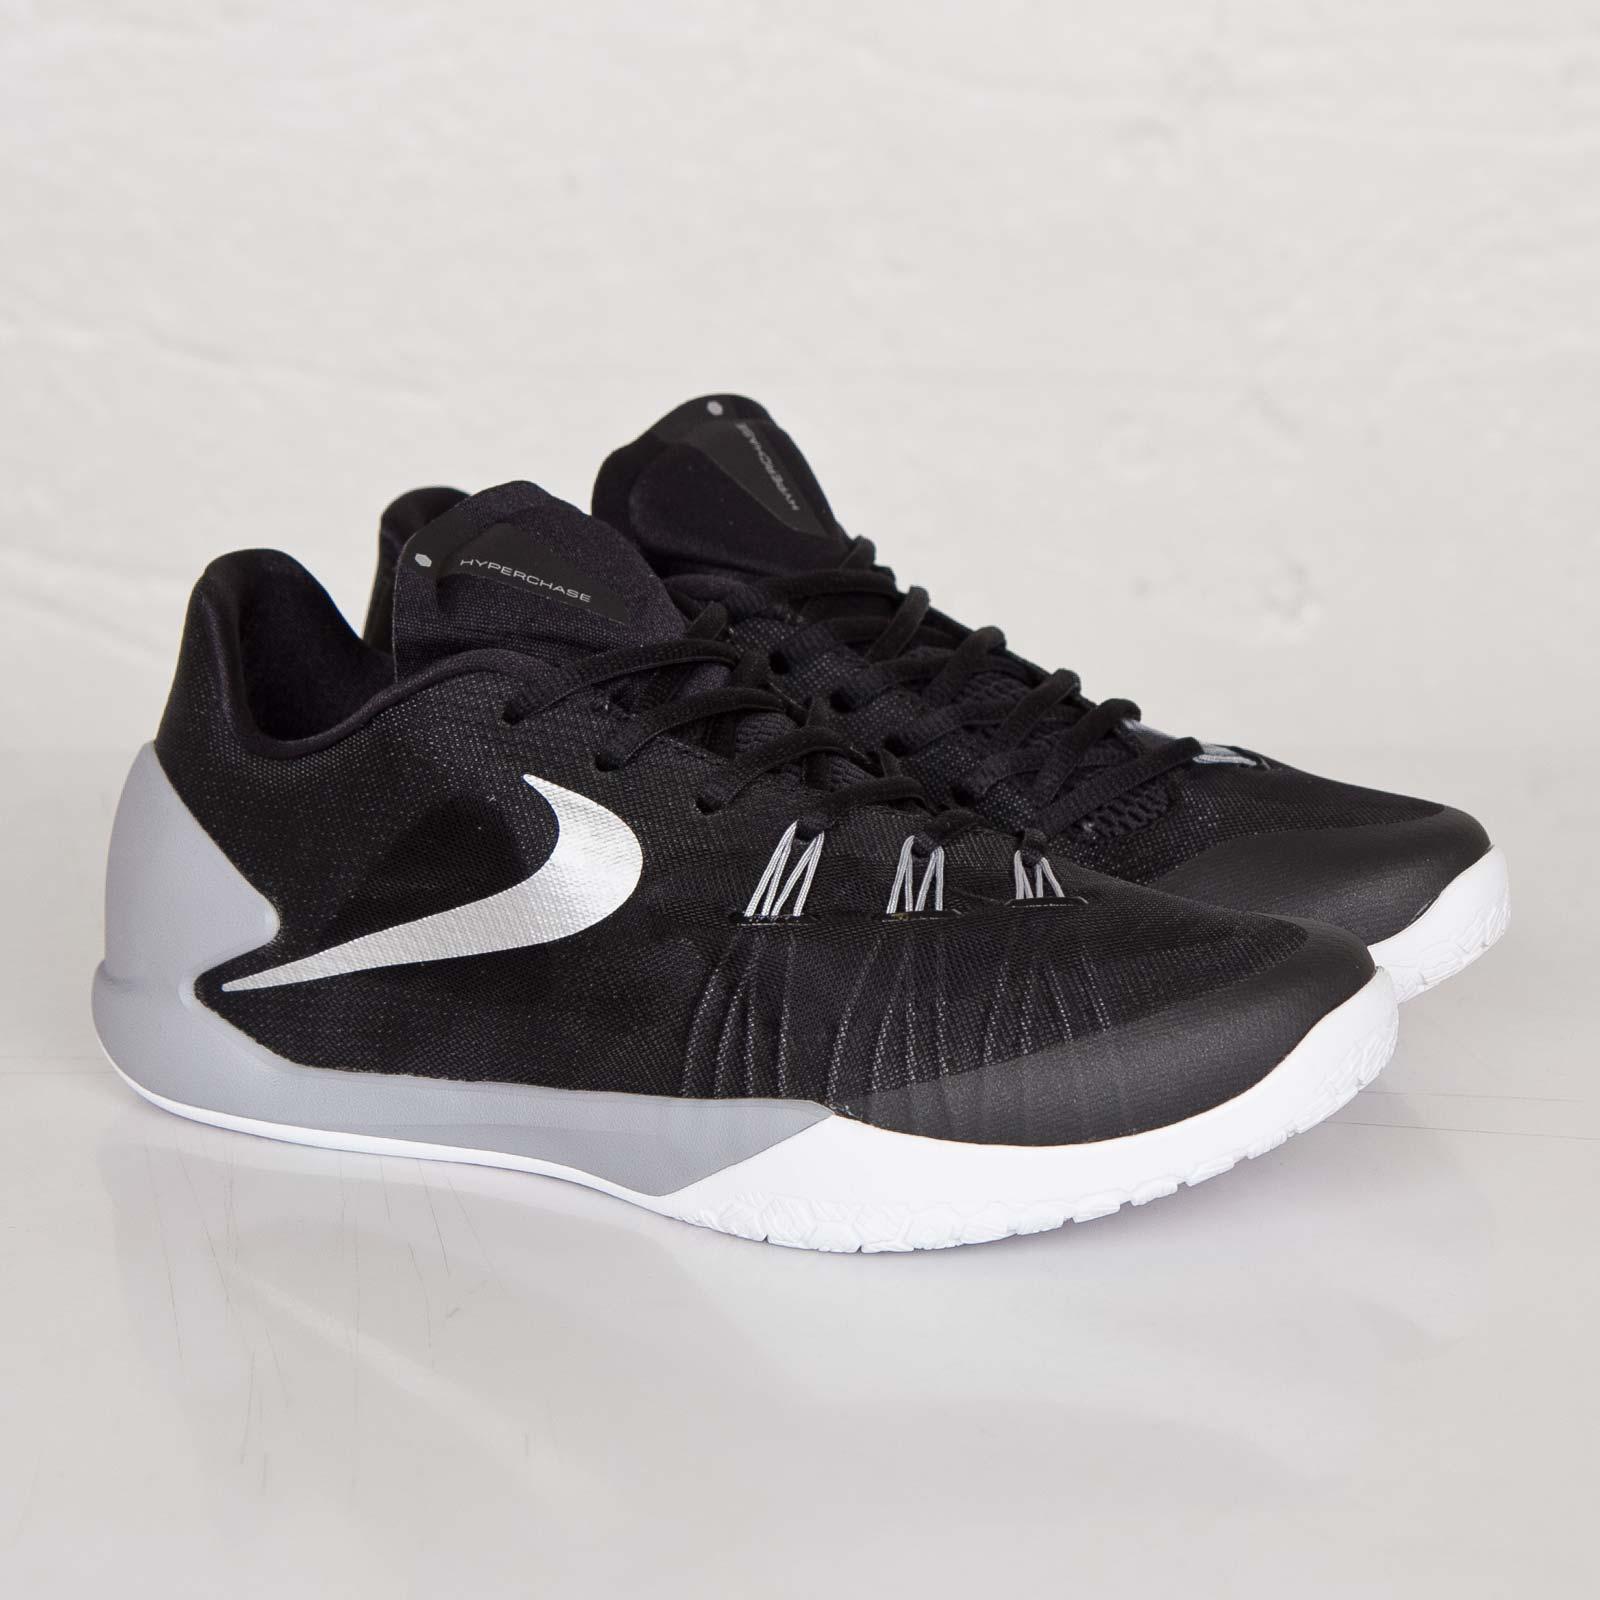 c7716351922d Nike Hyperchase - 705363-002 - Sneakersnstuff